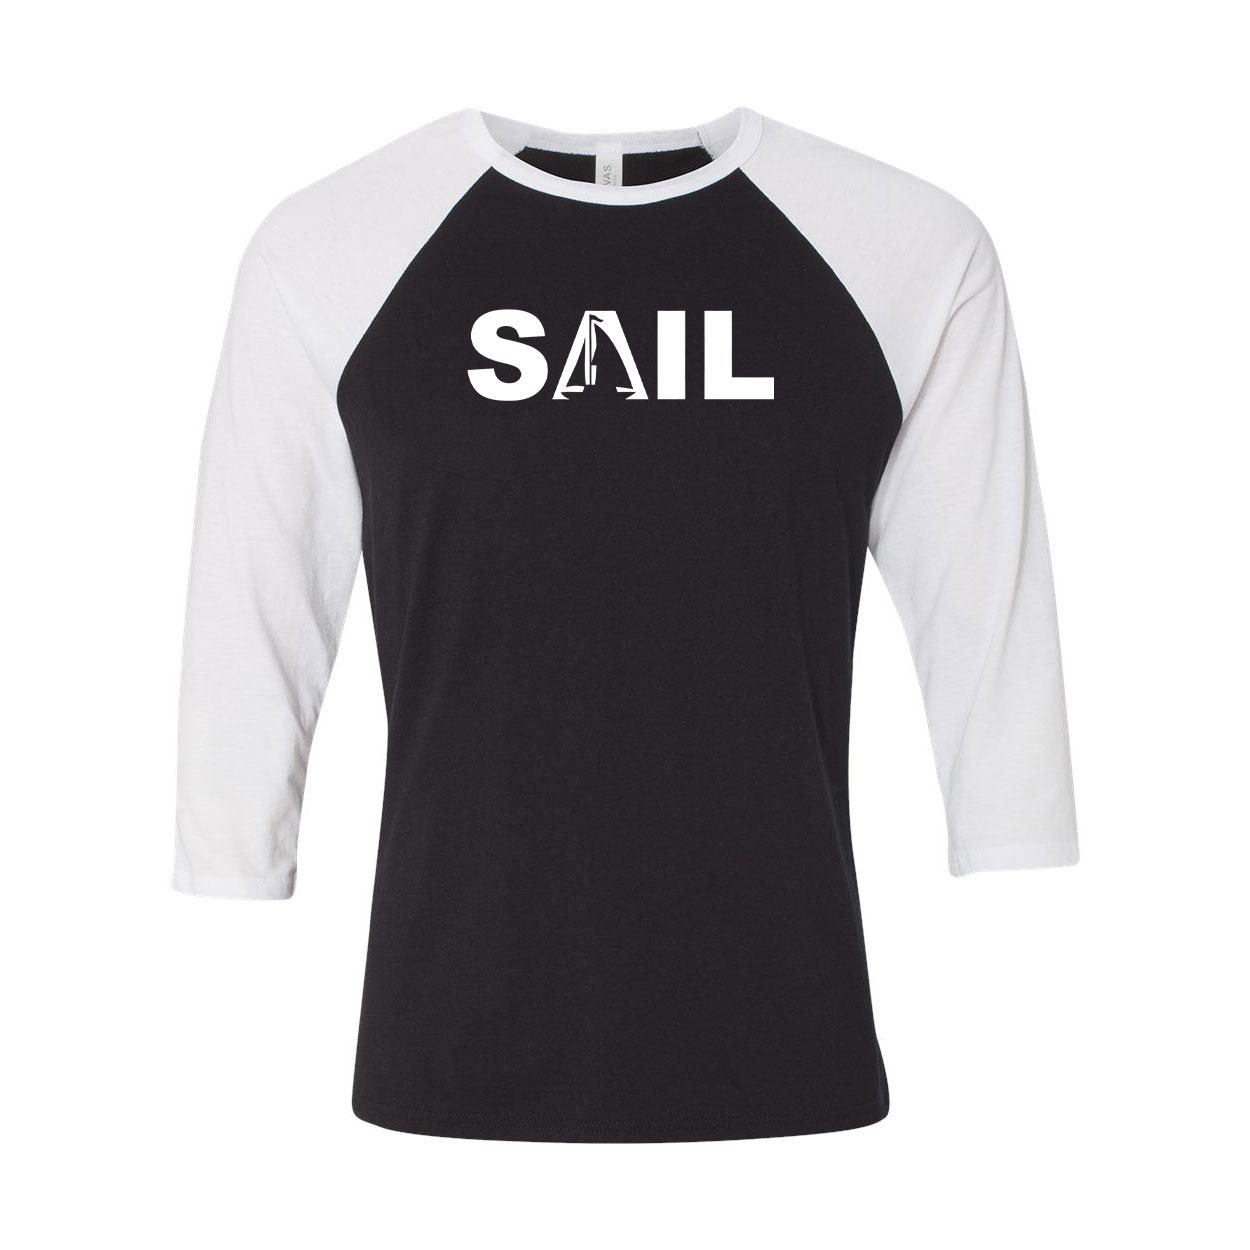 Sail Boat Logo Classic Raglan Shirt Black/White (White Logo)